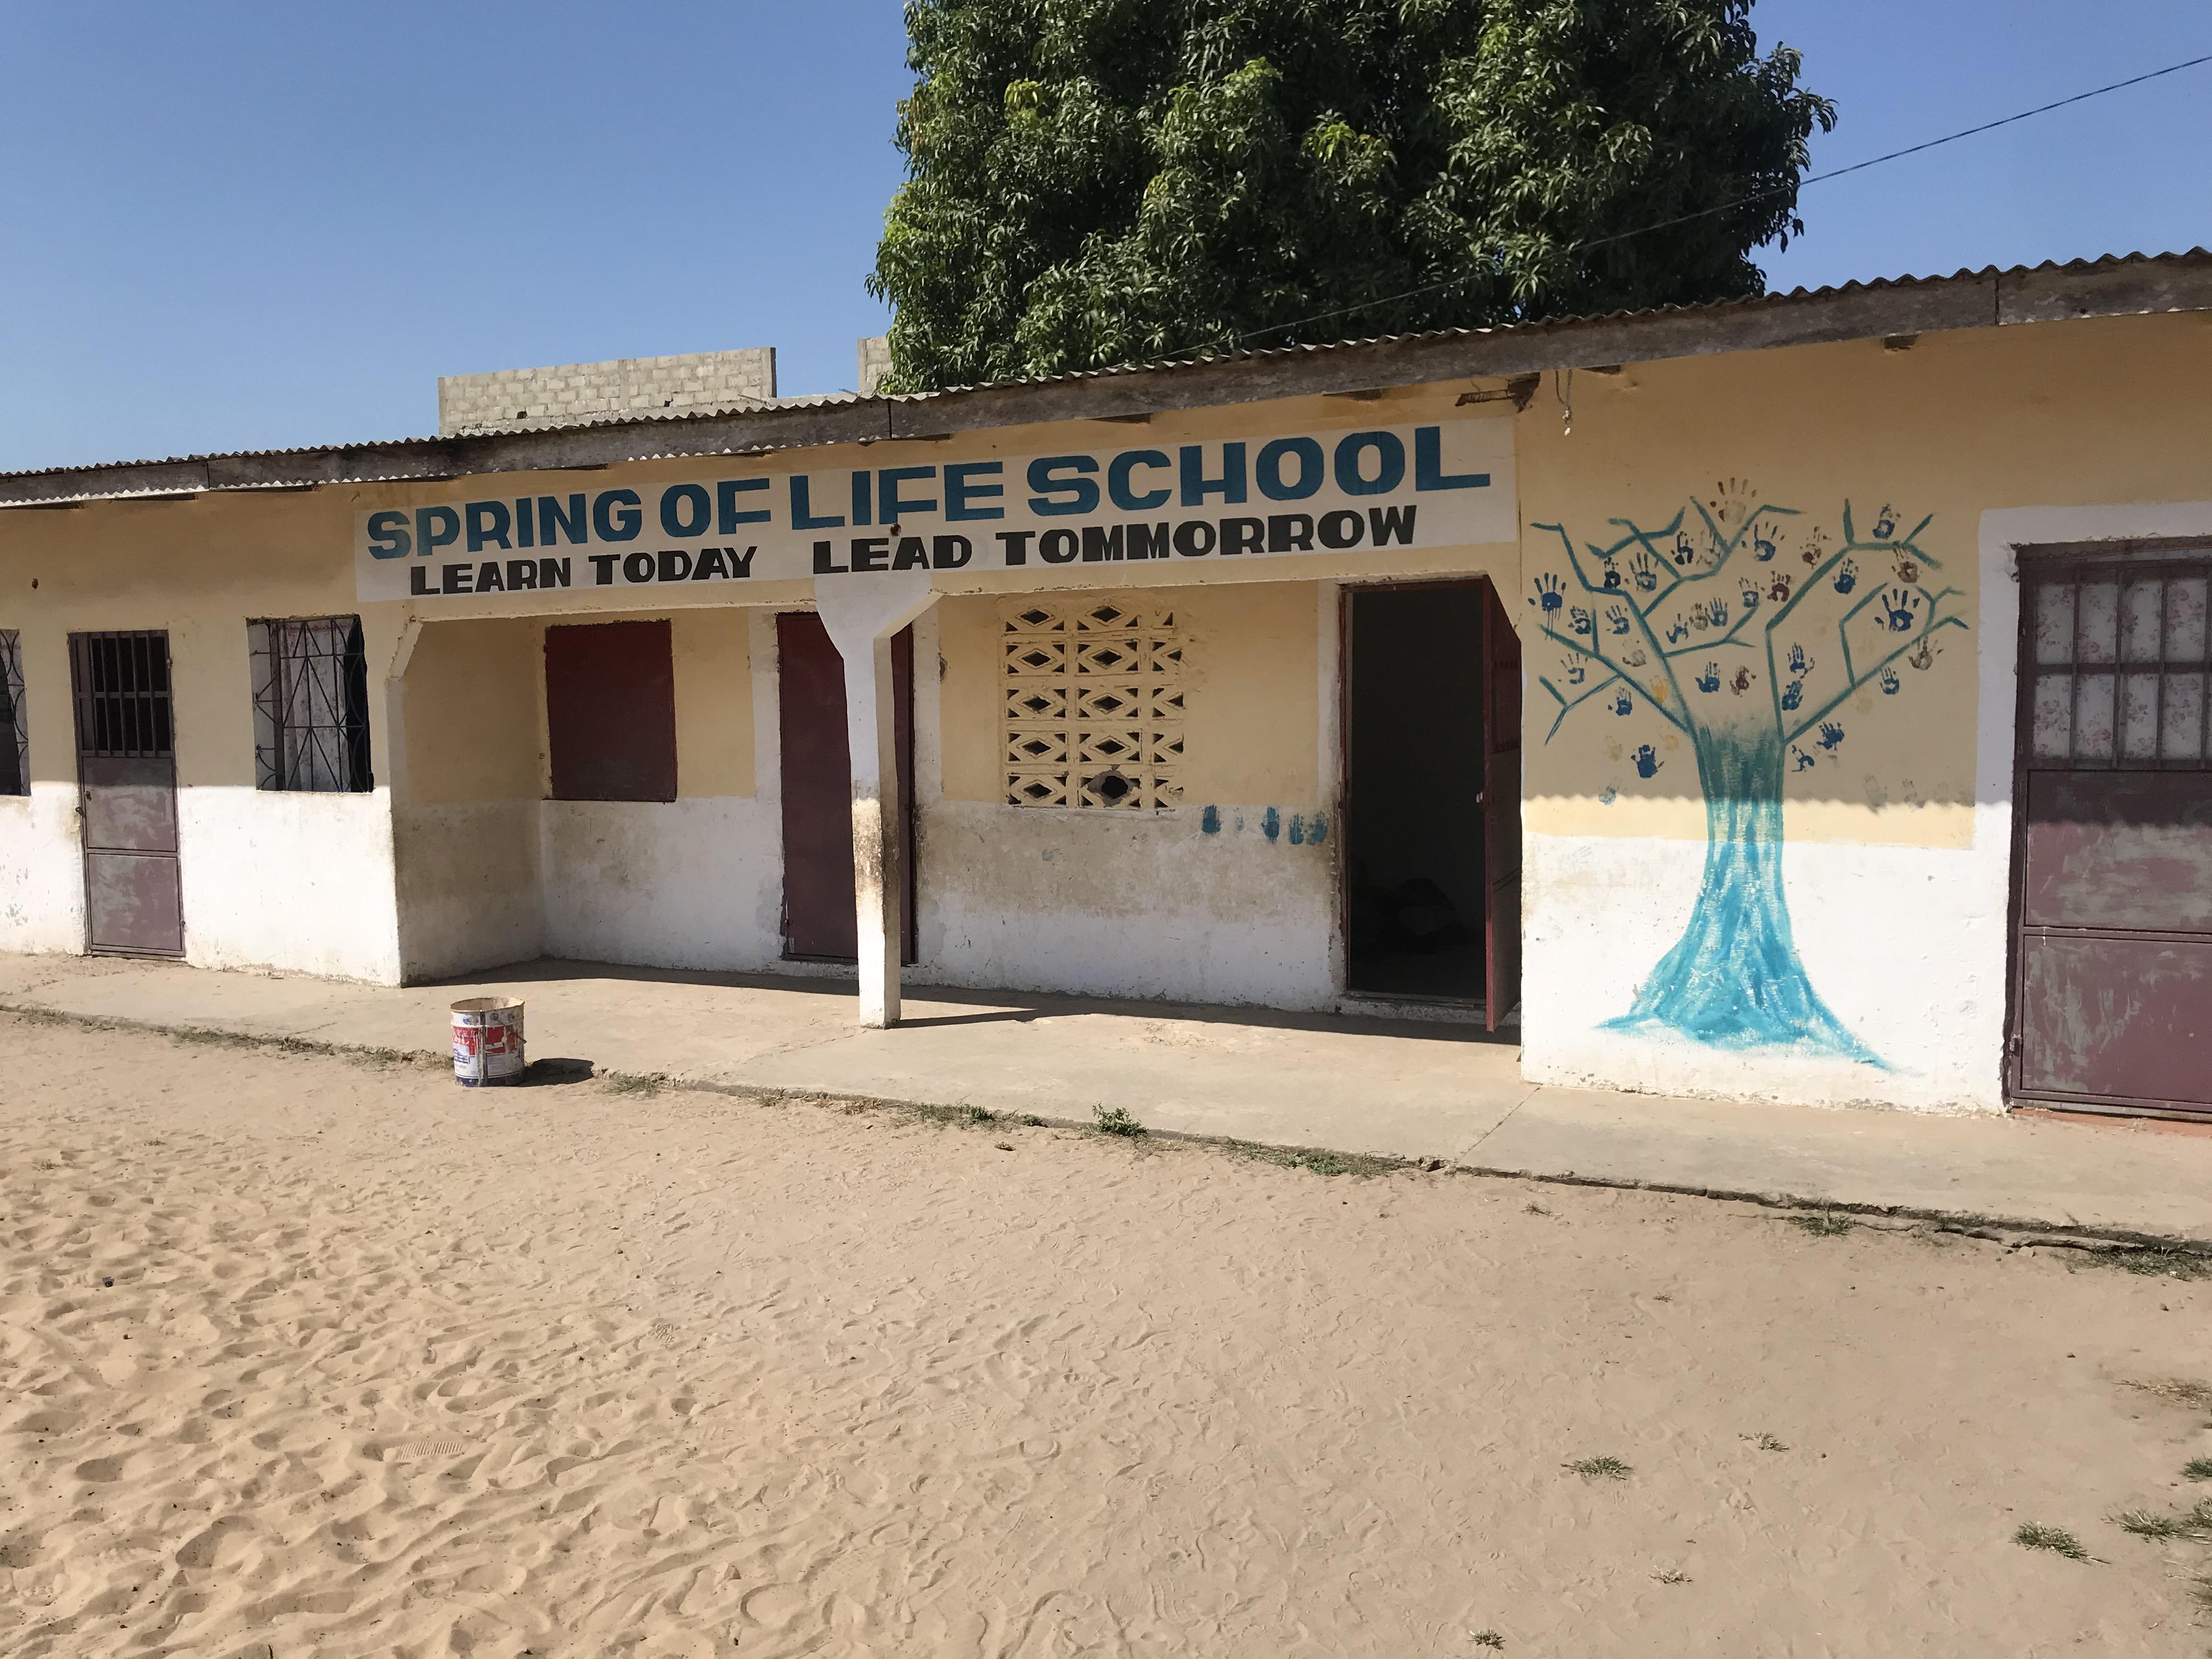 Spring of Life School